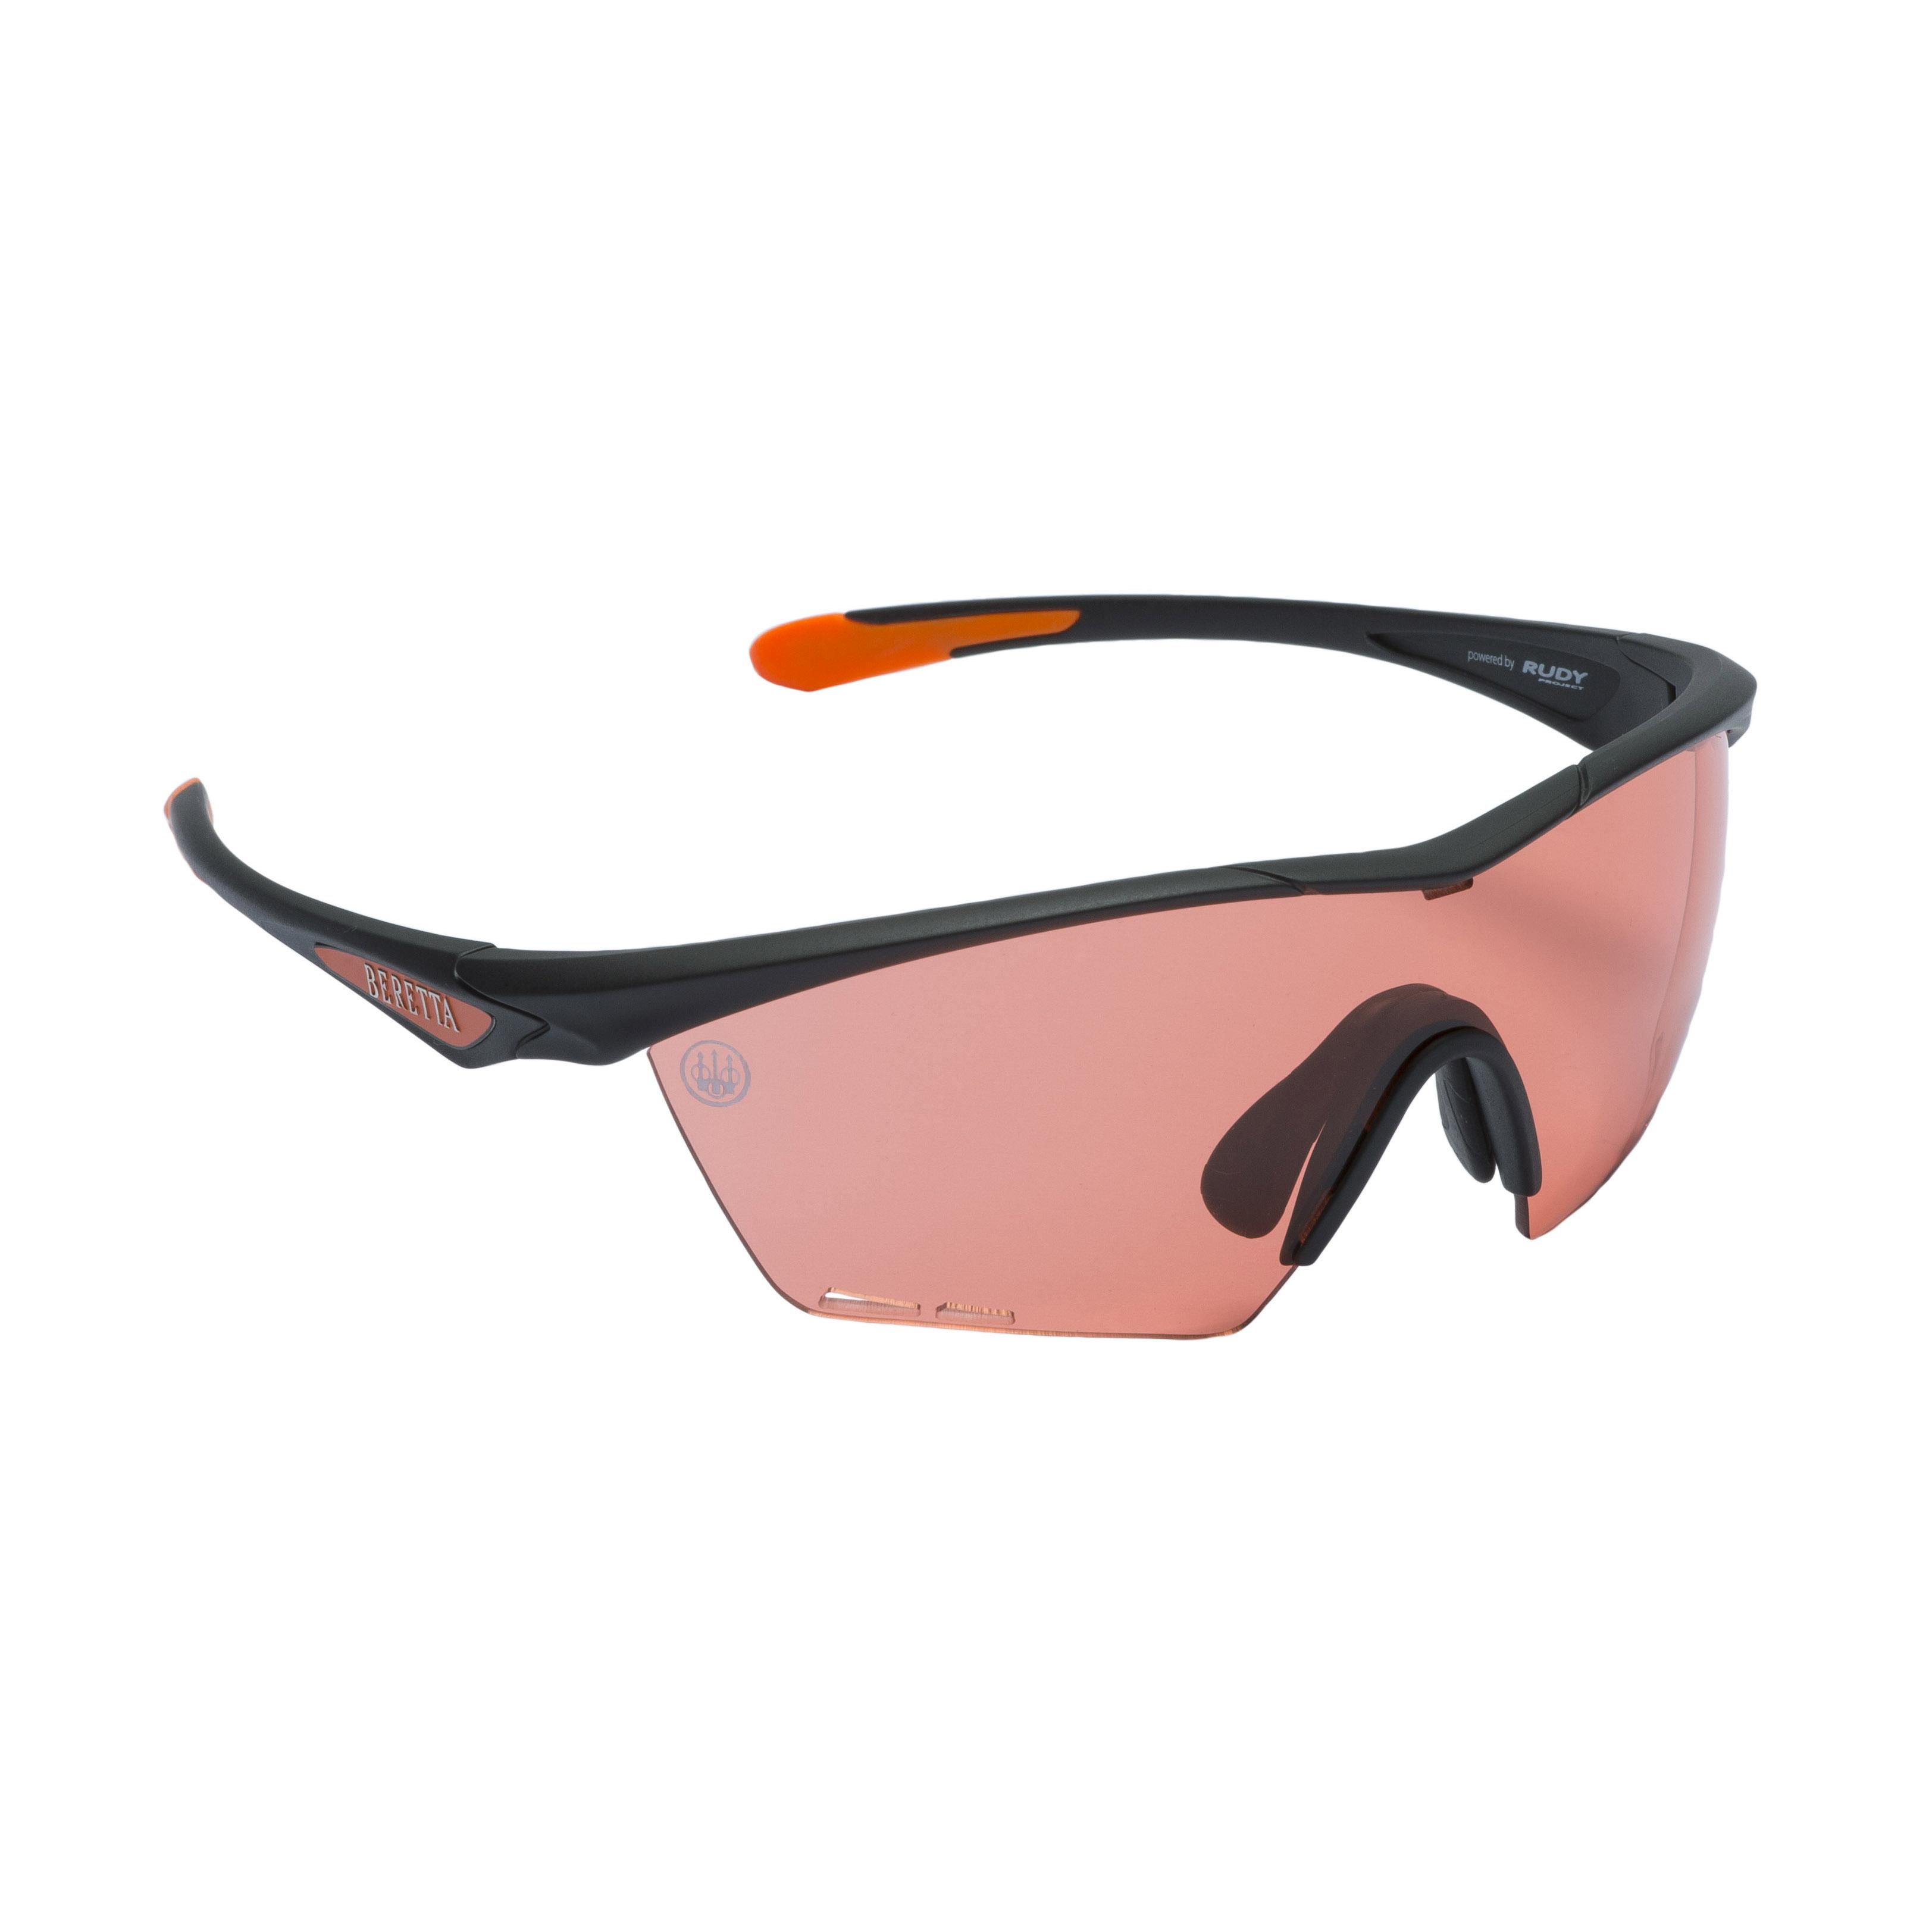 a0dba60bddb Beretta clash shooting glasses scarlet stoeger canada jpg 3247x3247 Orange shooting  glasses